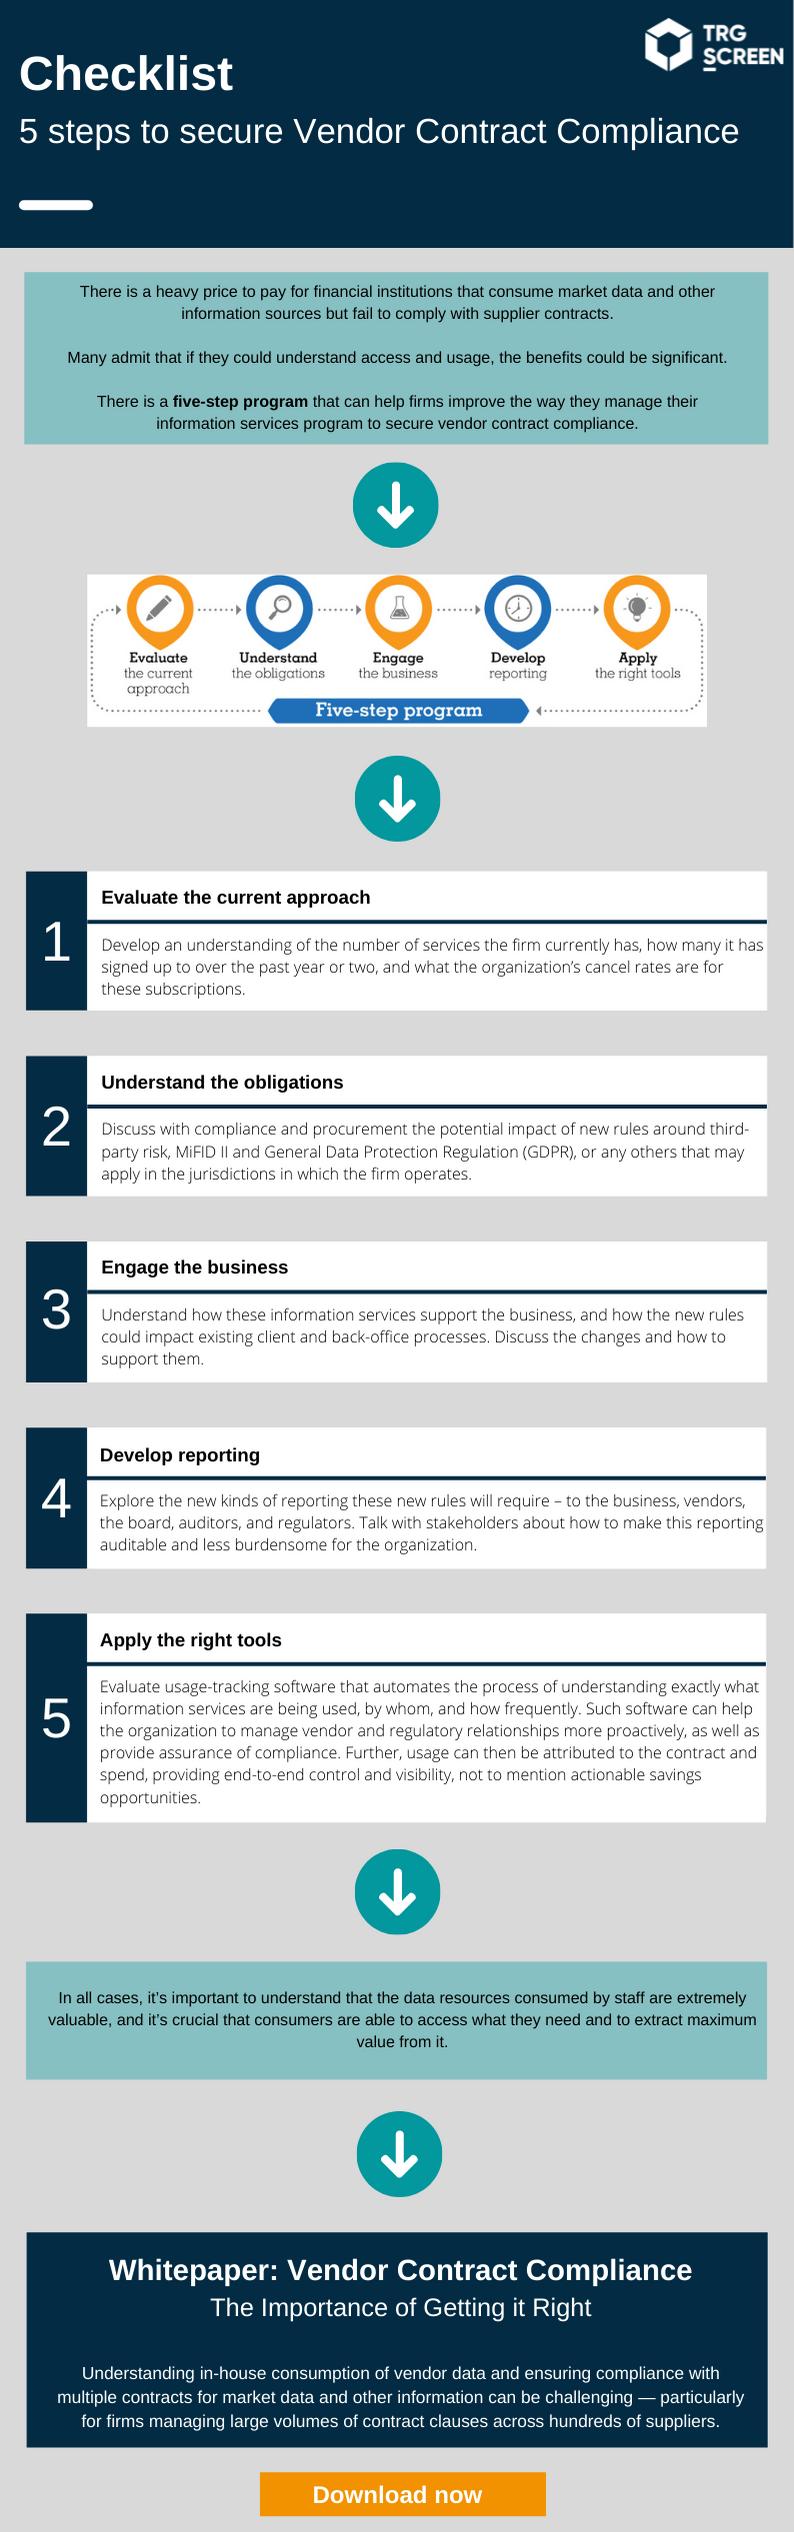 Checklist - 5 steps to secure Vendor Compliance-1